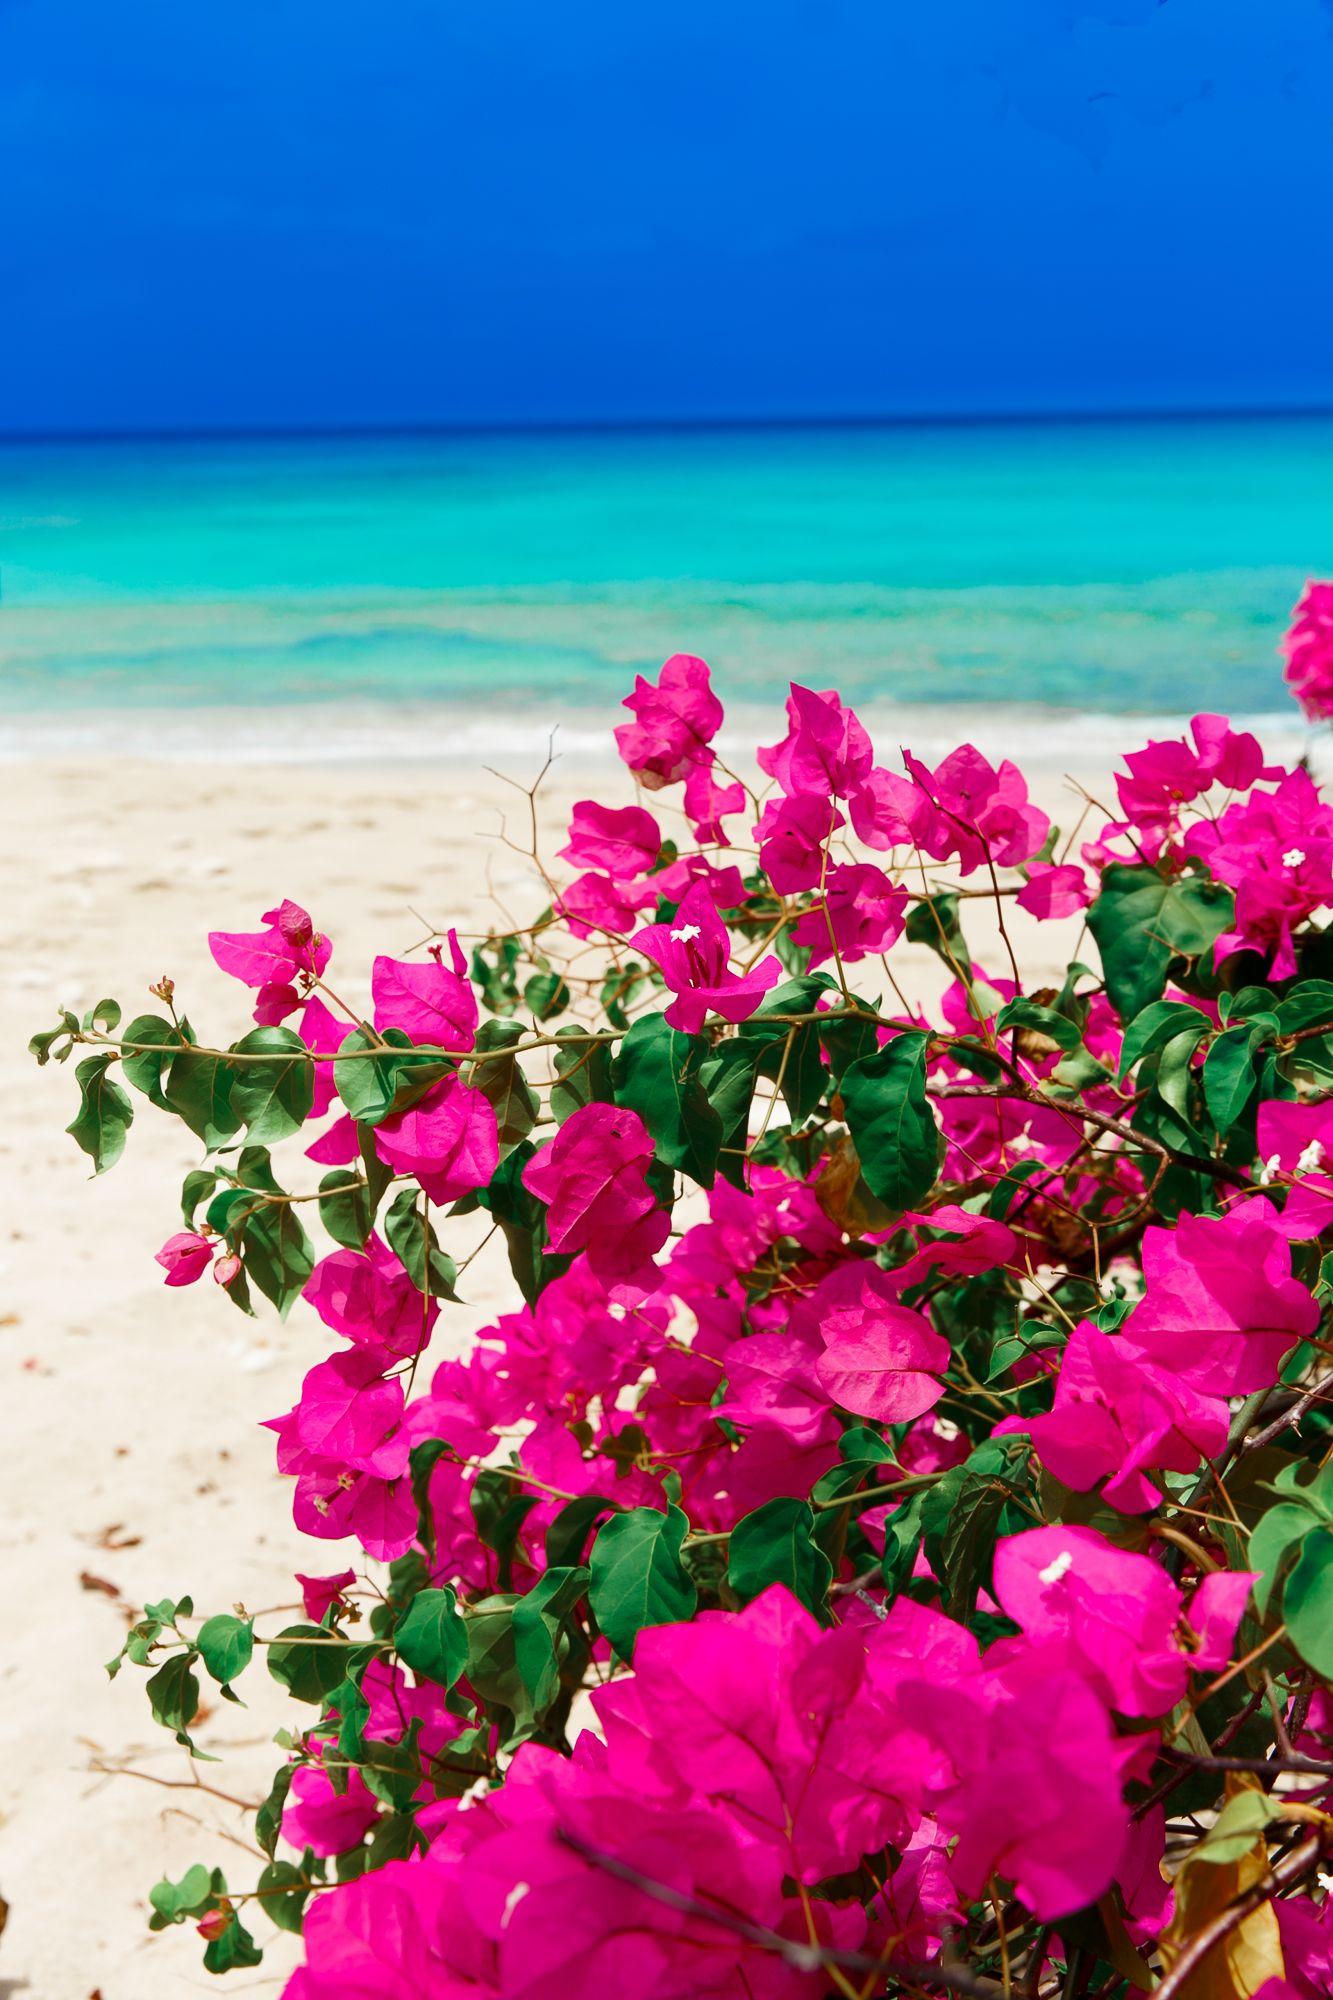 Beautiful Flower Wallpaper For Girls Desktop Wallpaper Rose Flower Wallpaper Blue Flower Wallpaper Wallpaper Nature Flowers